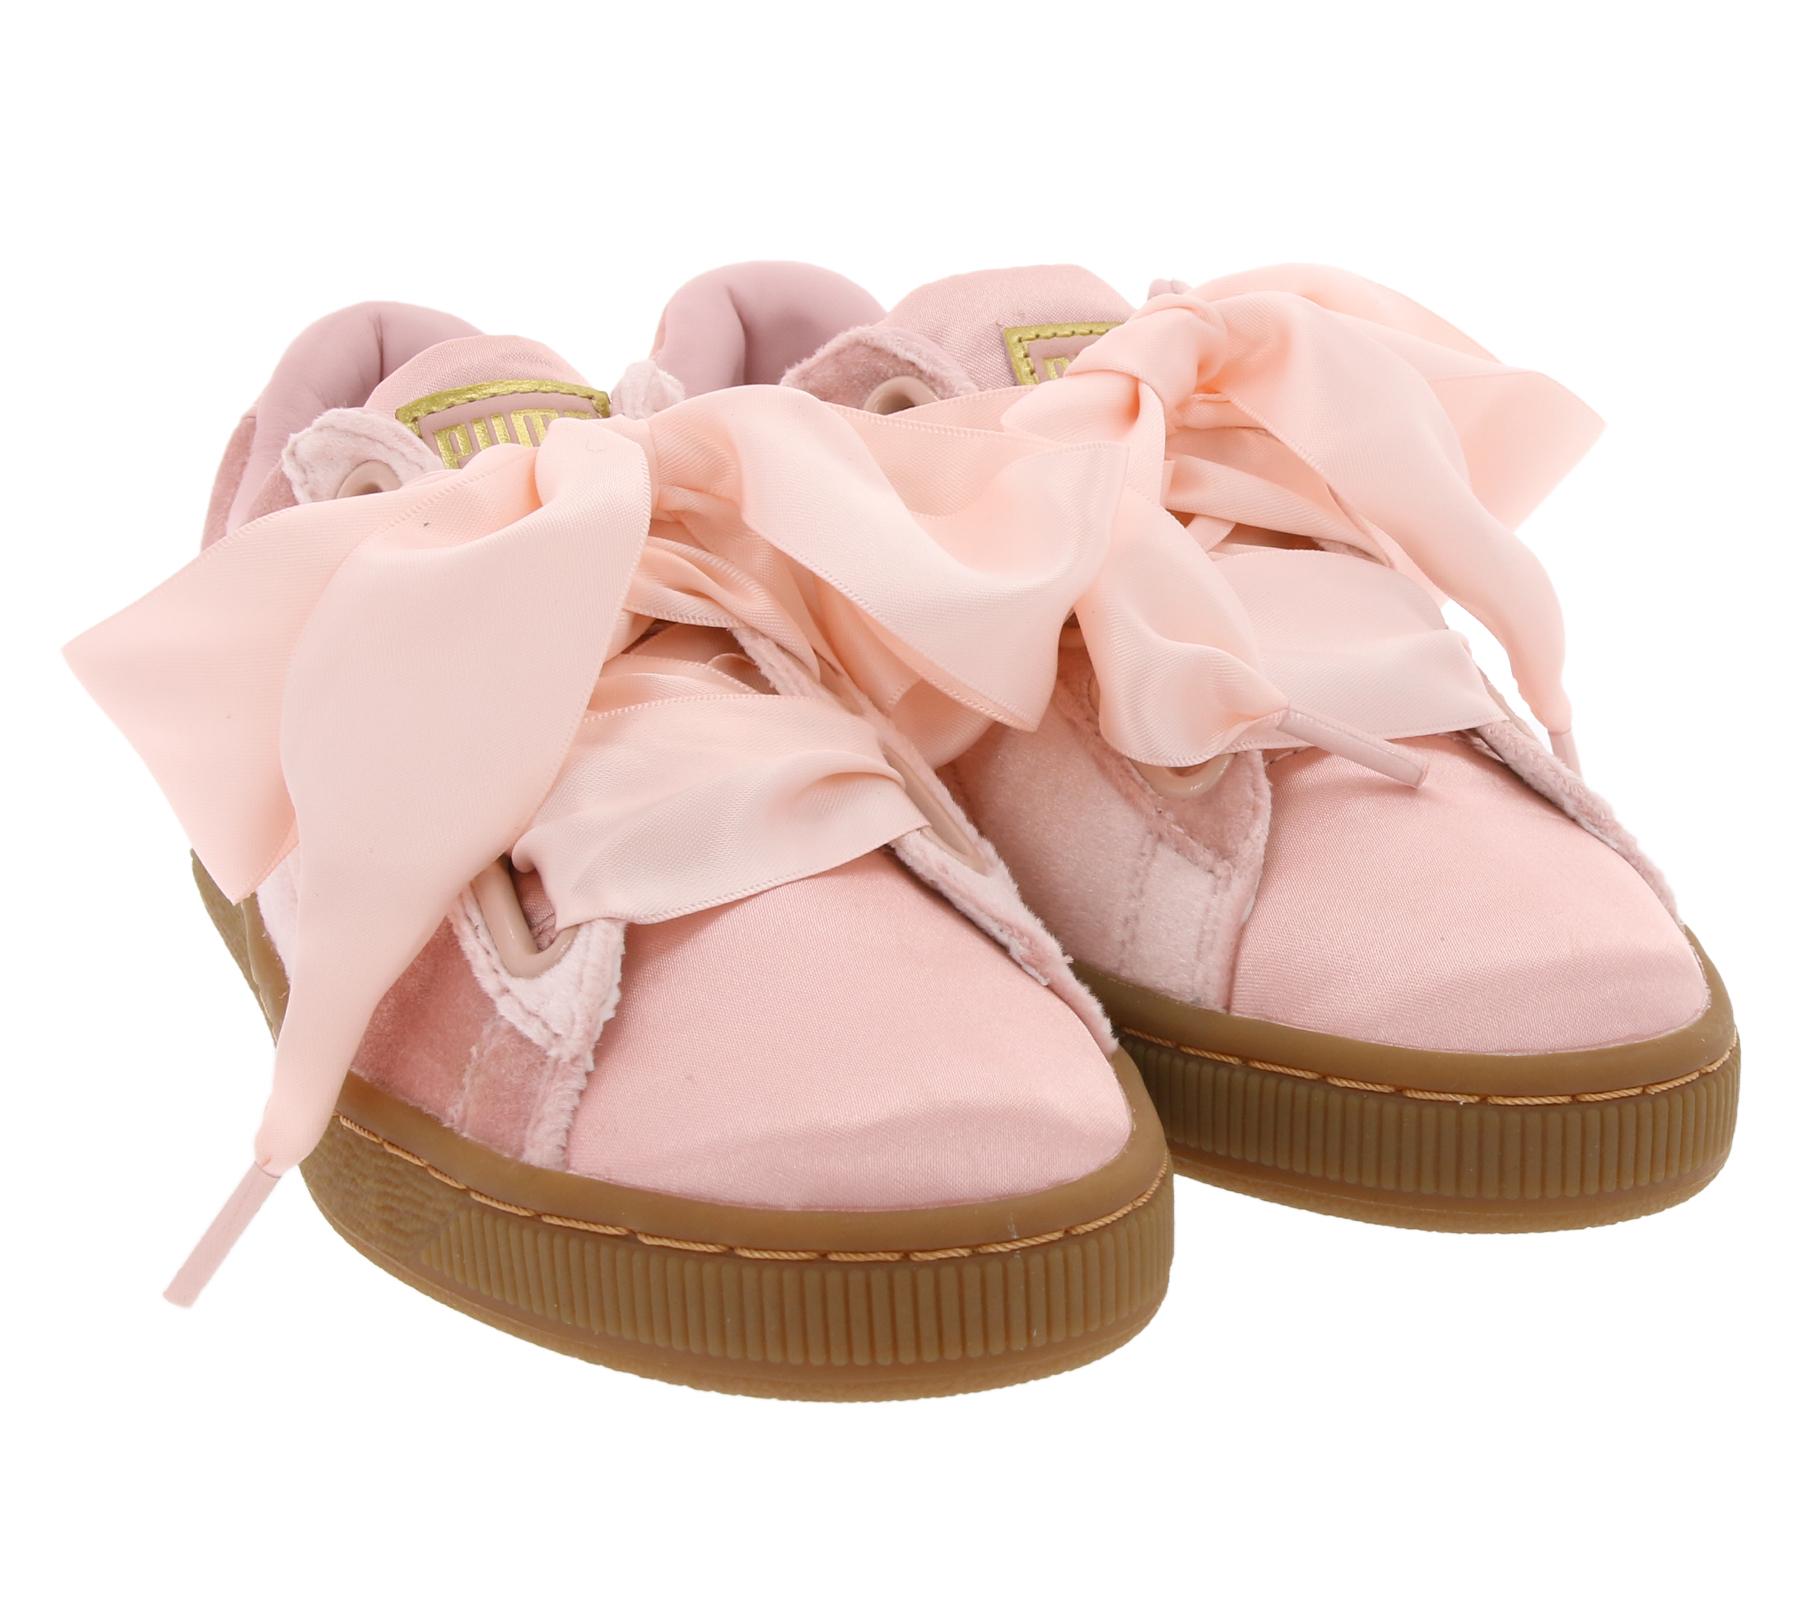 PUMA Damen Sneaker Basket Heart trendige Schuhe Pink   O46